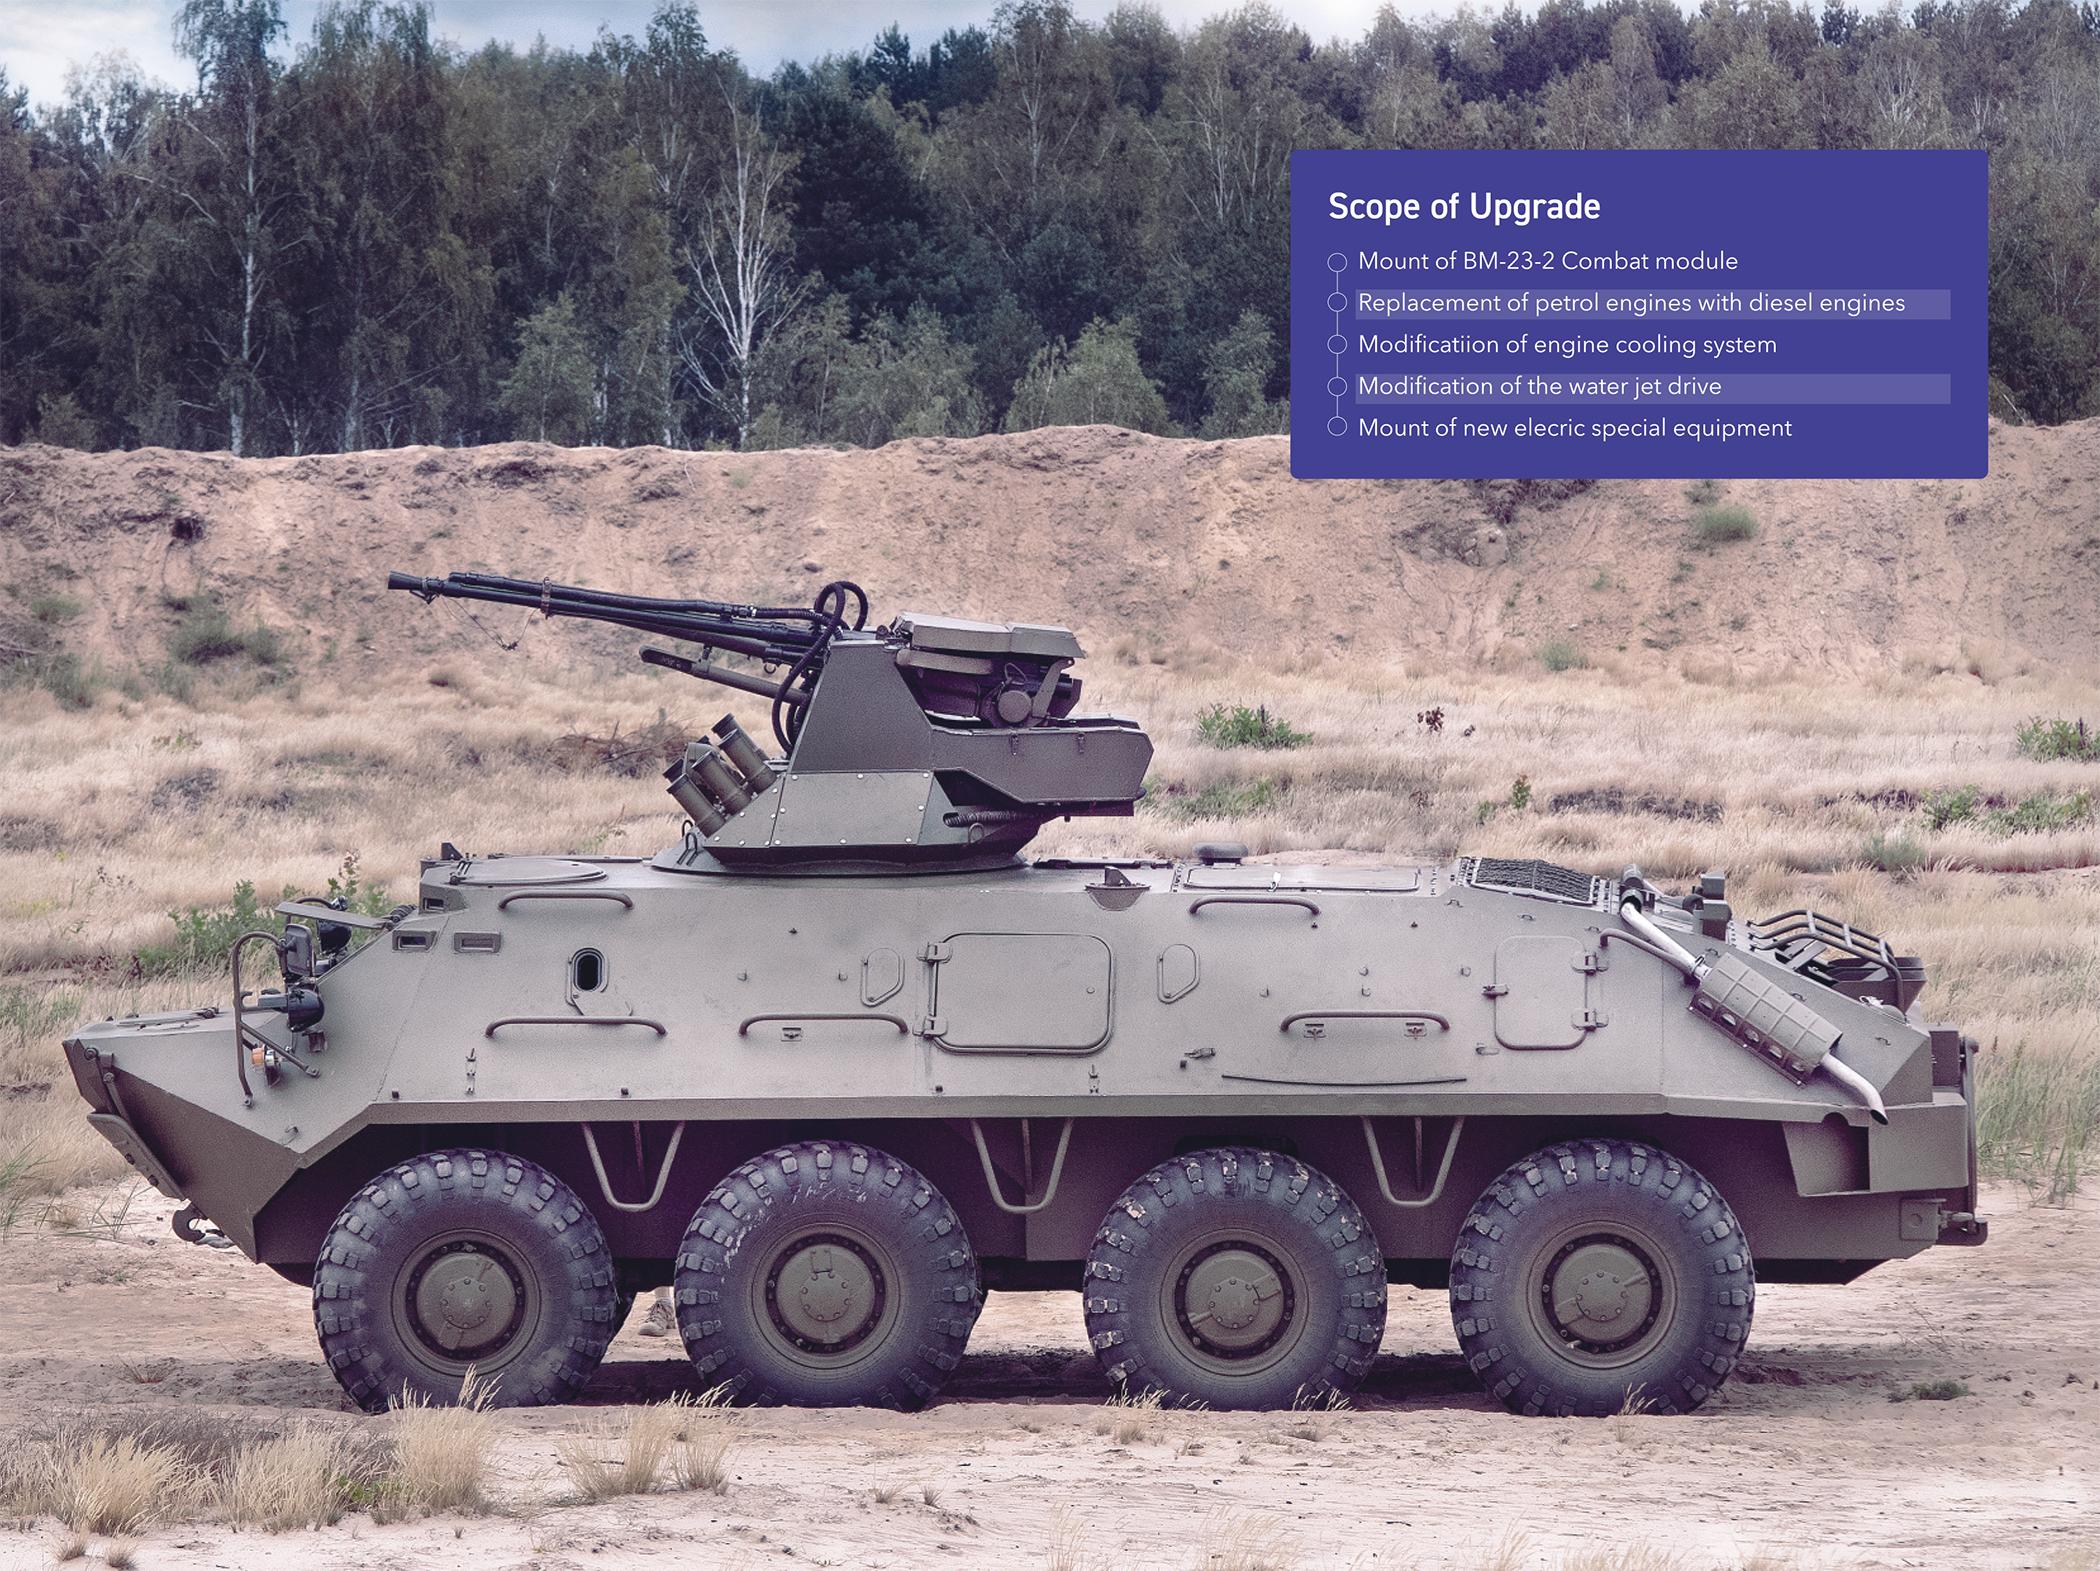 BTR-60PB-T with the combat module BM-23-2